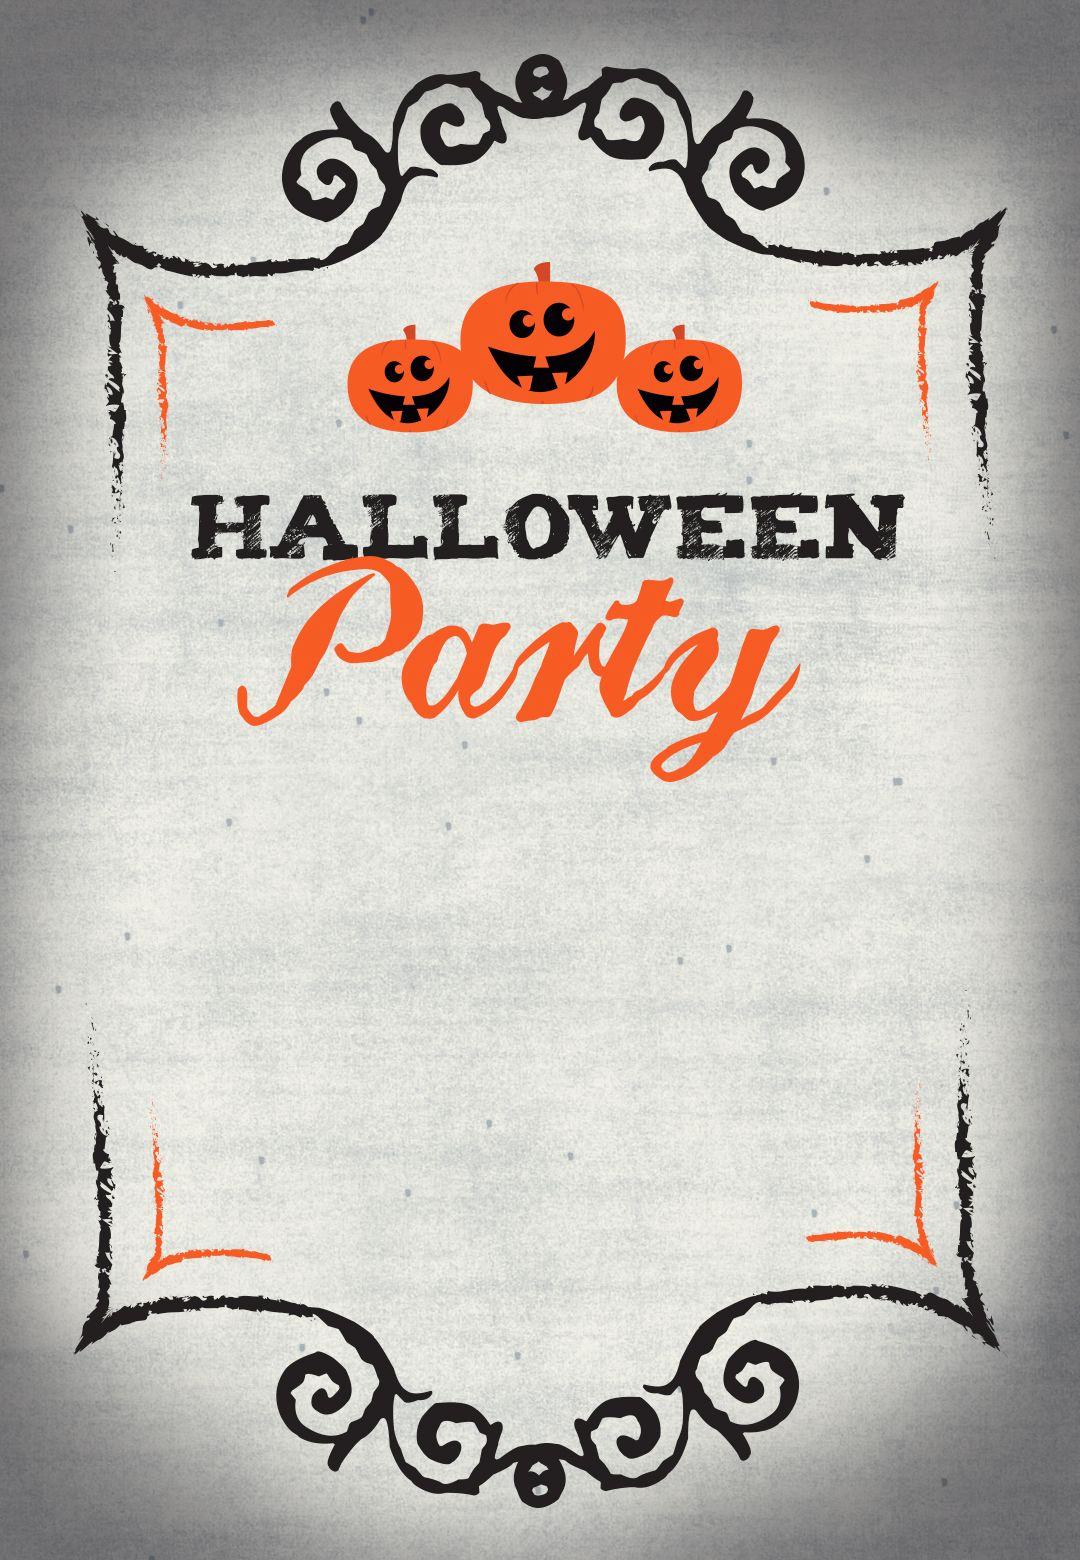 Free Halloween Invitation Printable Lovely Halloween Party Free Printable Halloween Invitation